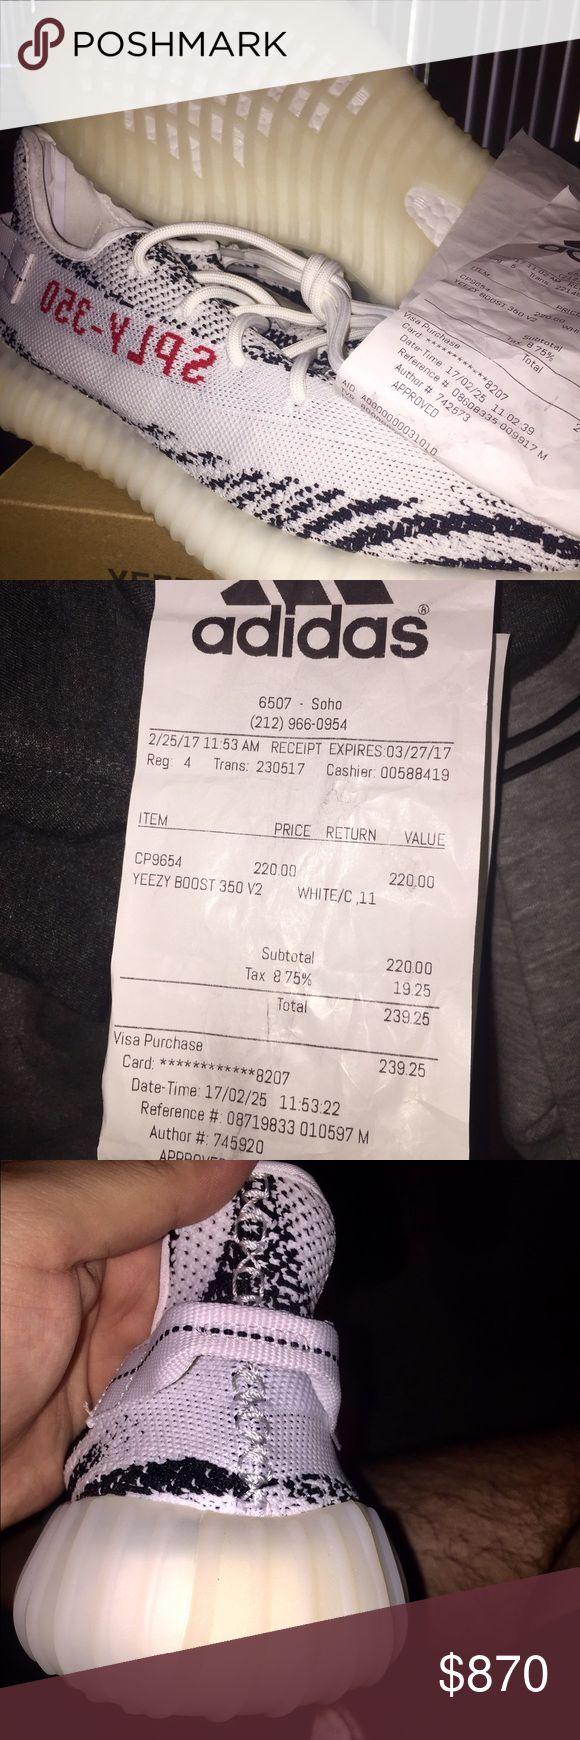 adidas yeezy 350 boost v2 zebra price adidas nmd white blue price